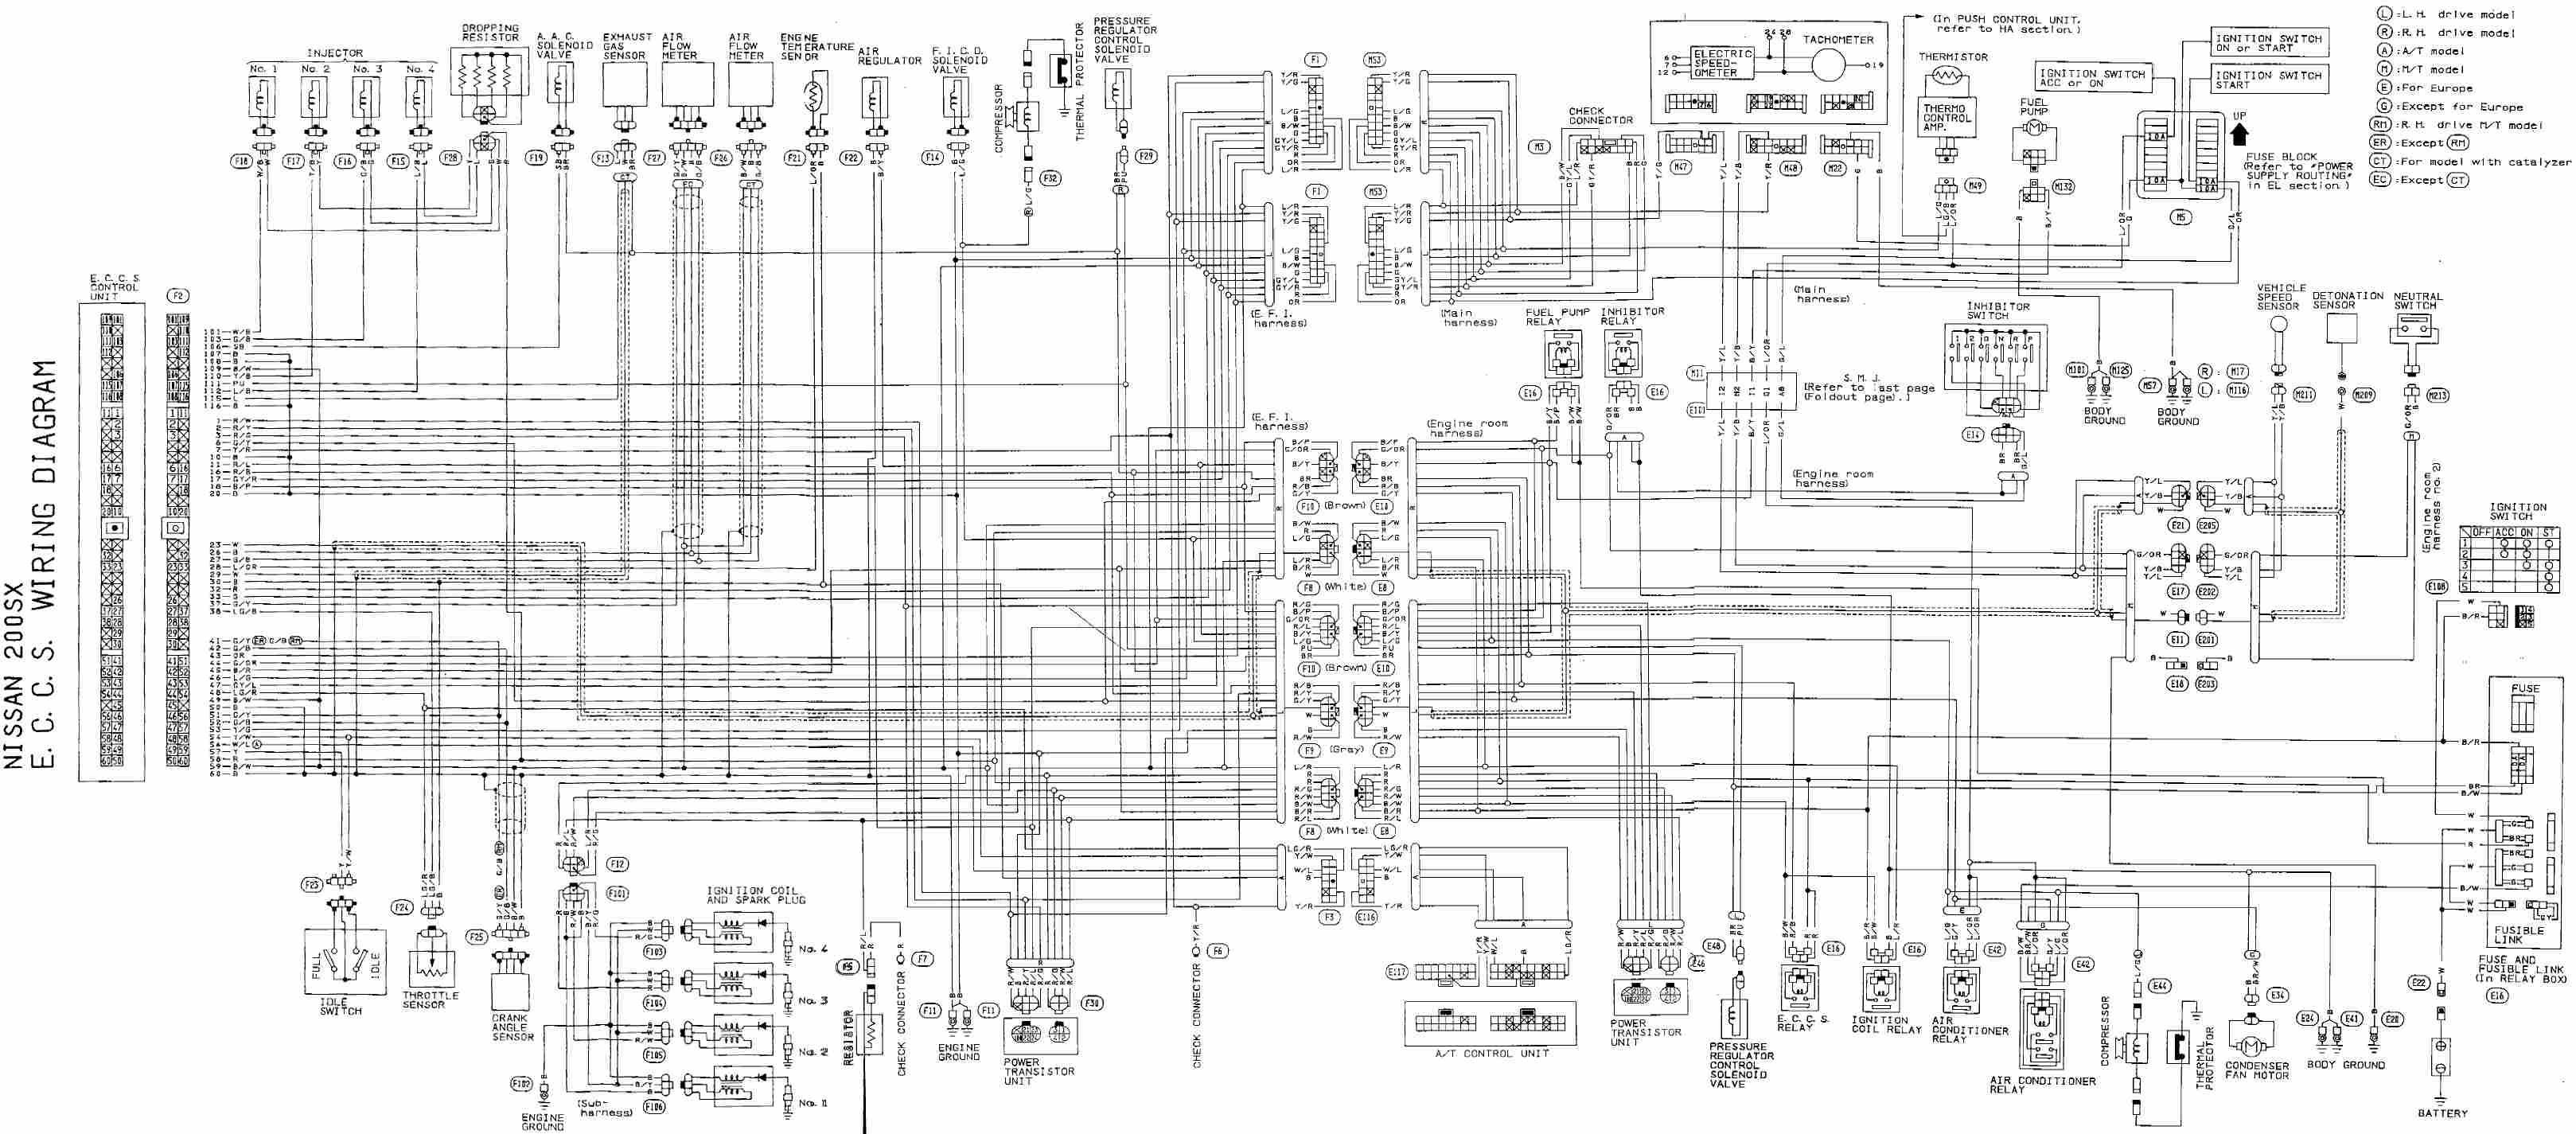 small resolution of 2001 nissan xterra radio diagram starting know about wiring diagram u2022 2002 xterra wiring diagram 2001 nissan xterra car stereo wiring diagram